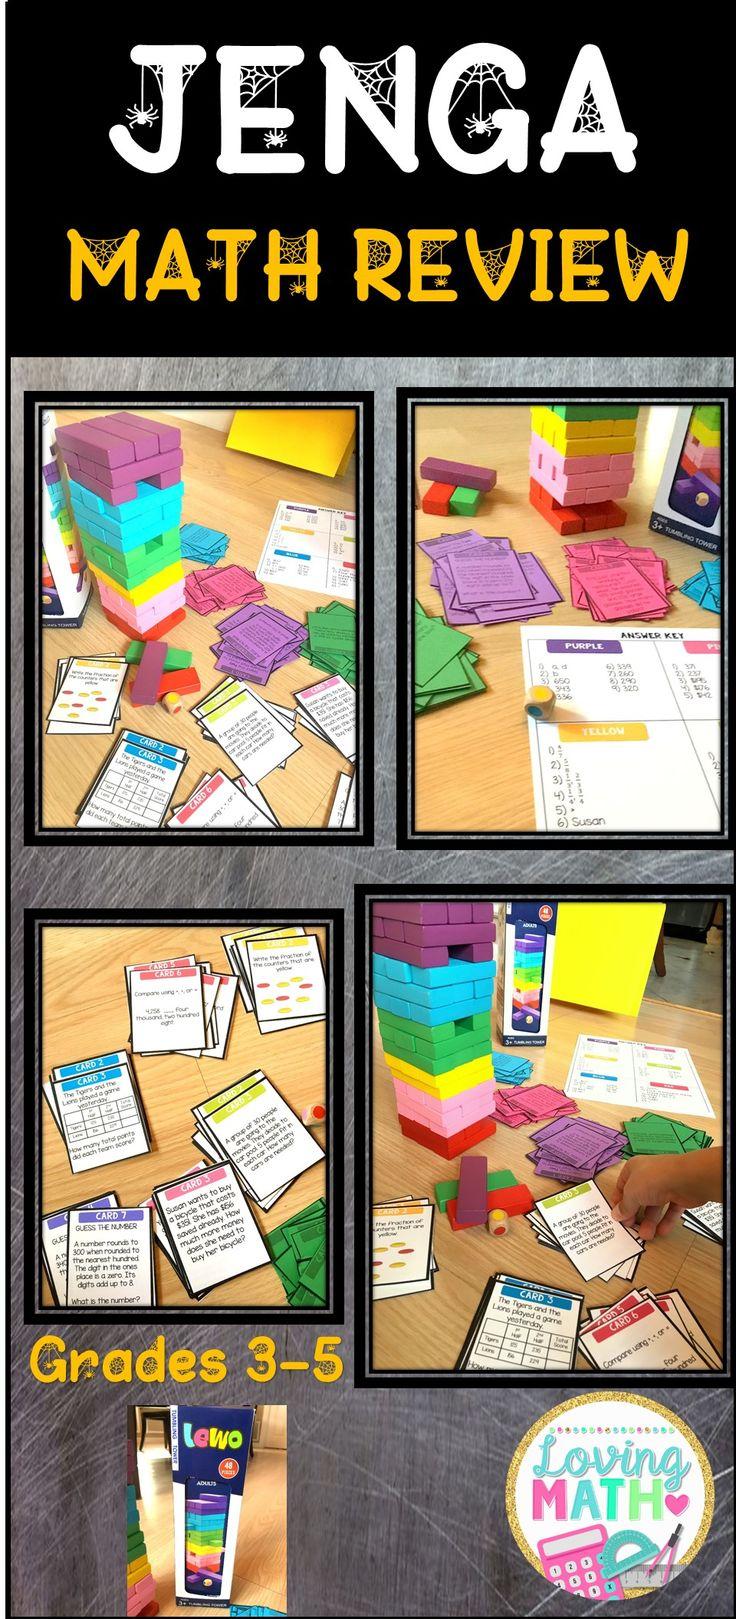 Super fun game to review math skills!!